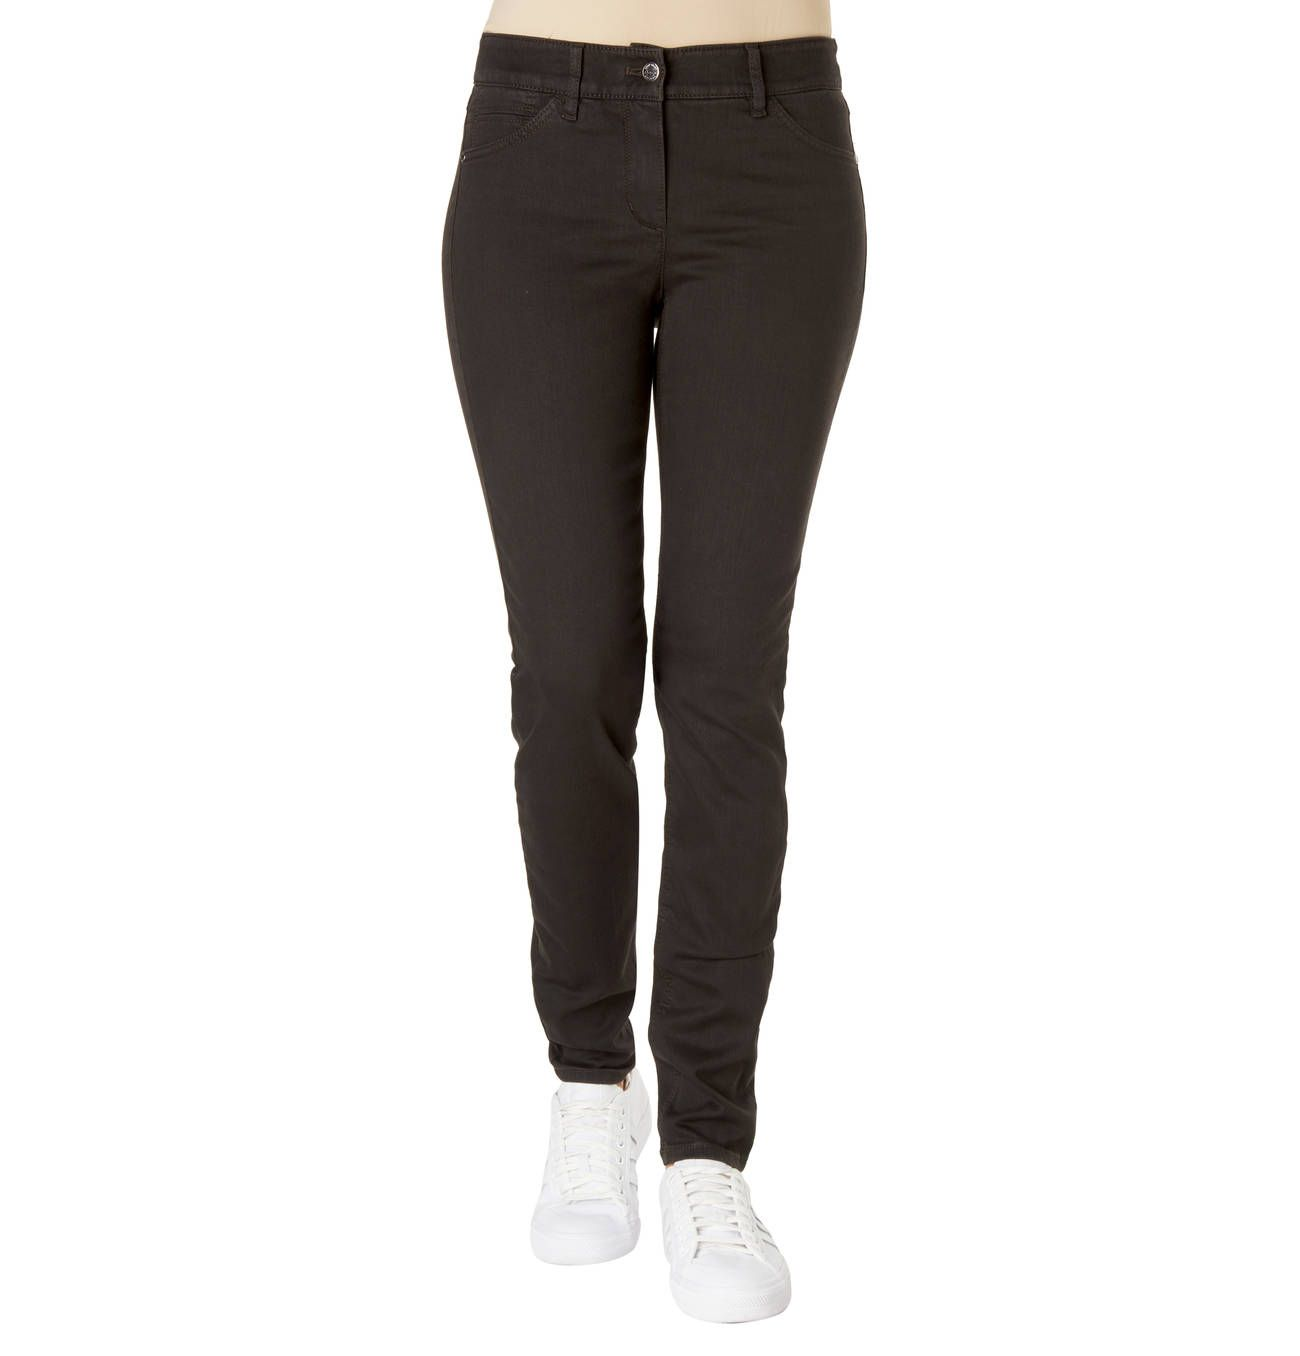 Jeans Best4me Skinny Fit